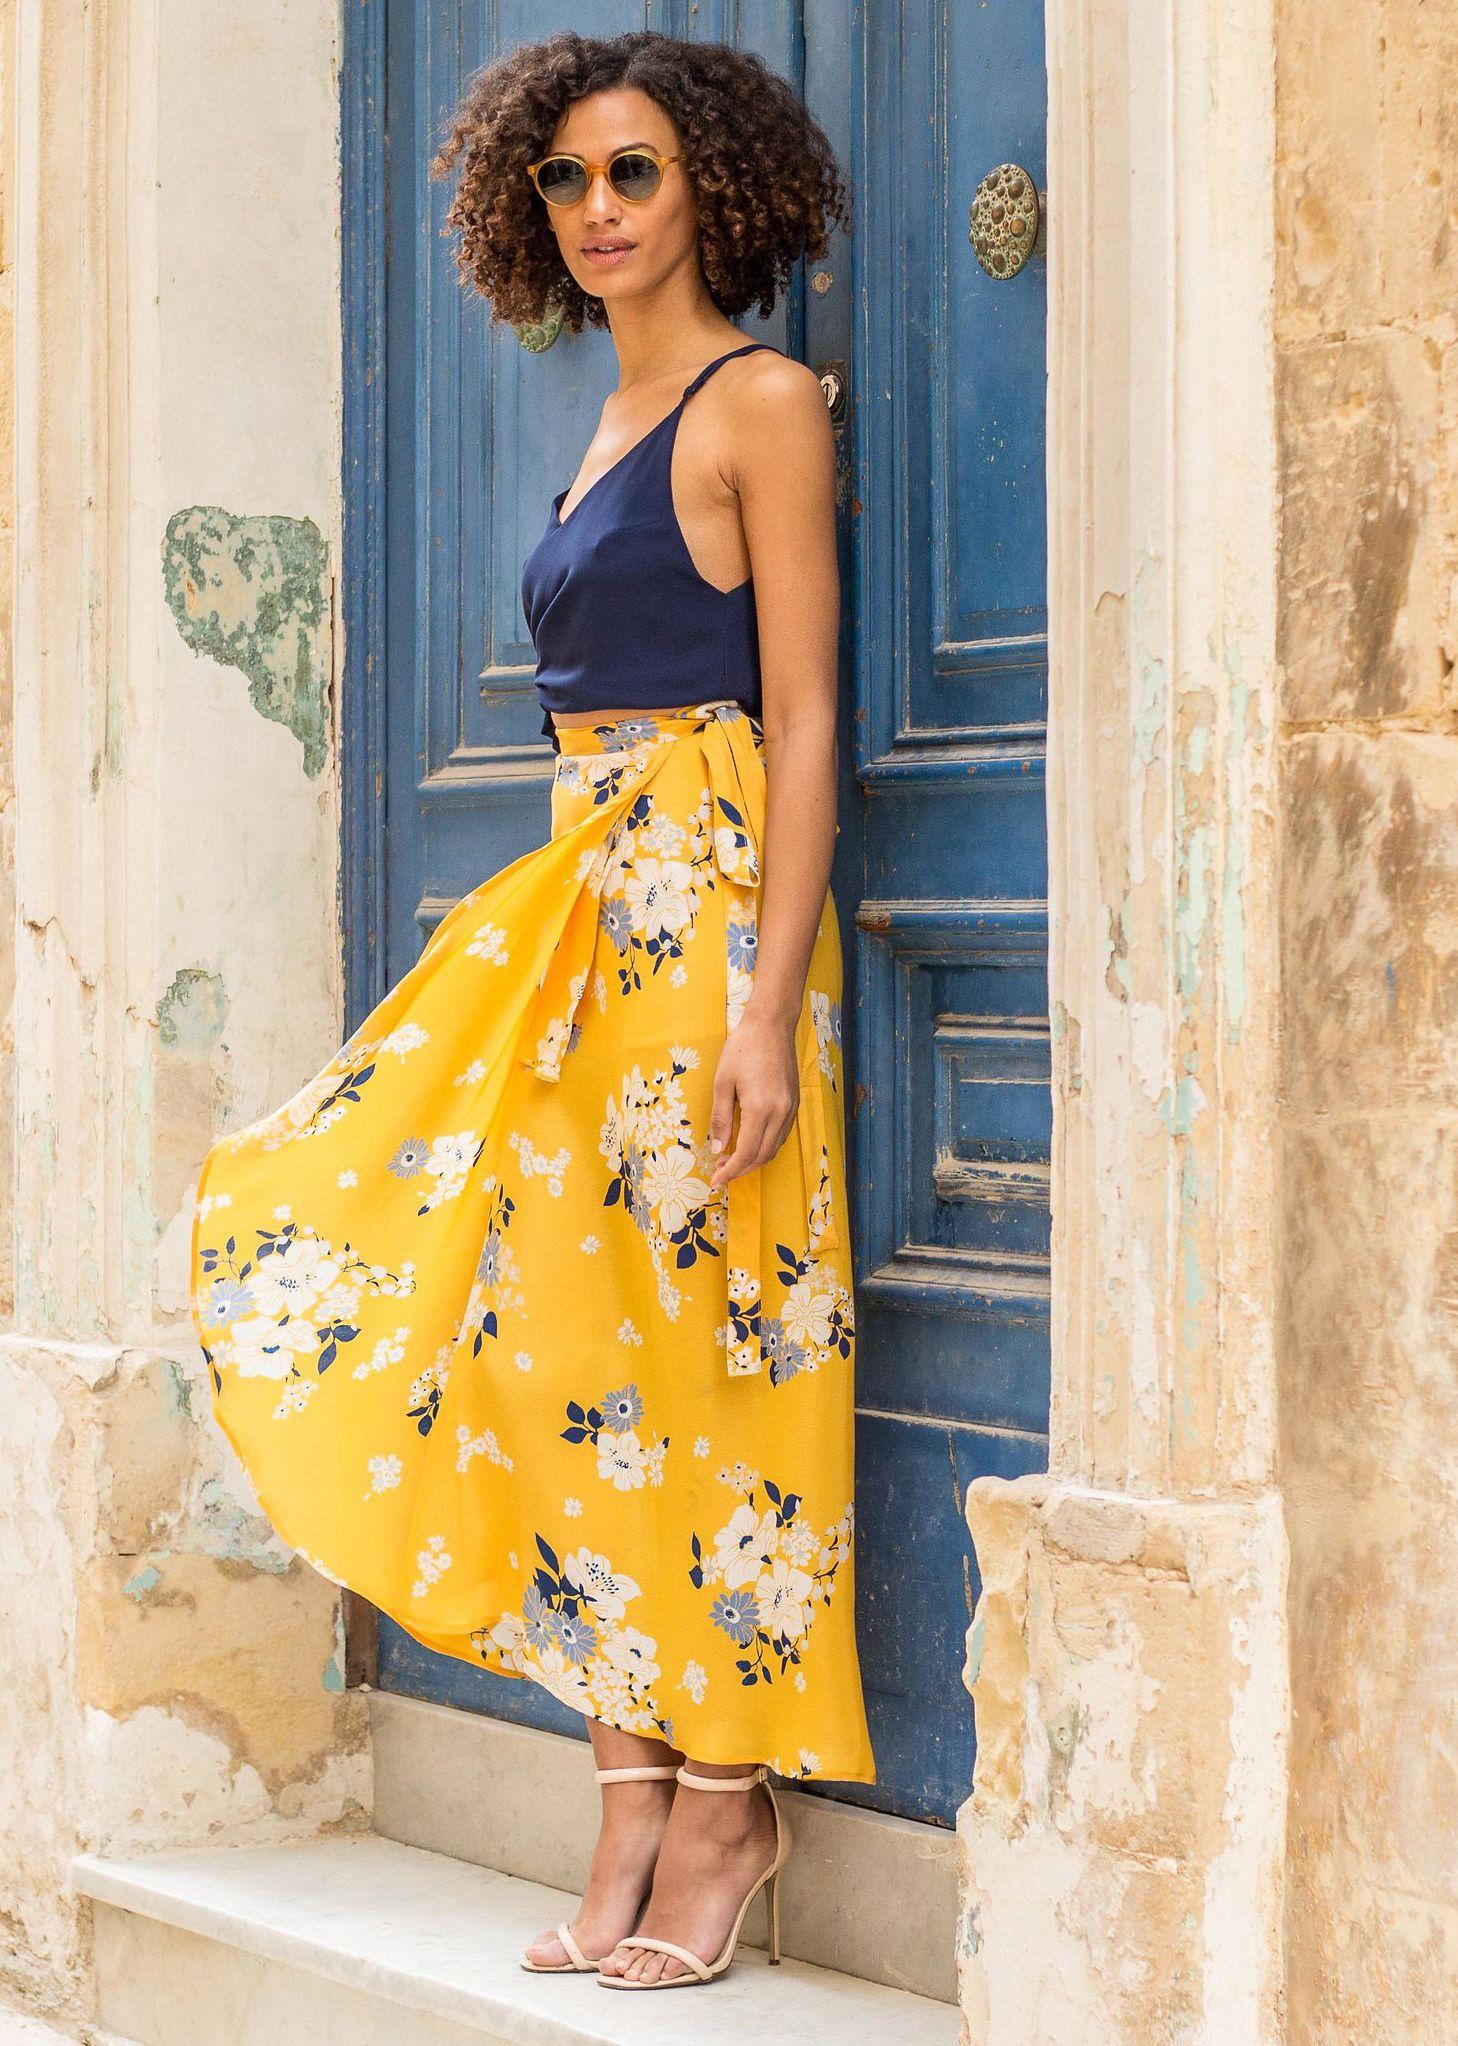 d9e261c769 Maxi Wrap Skirt Yellow Floral Print. Maxi Wrap Skirt Yellow Floral Print  Yellow Dress Summer ...